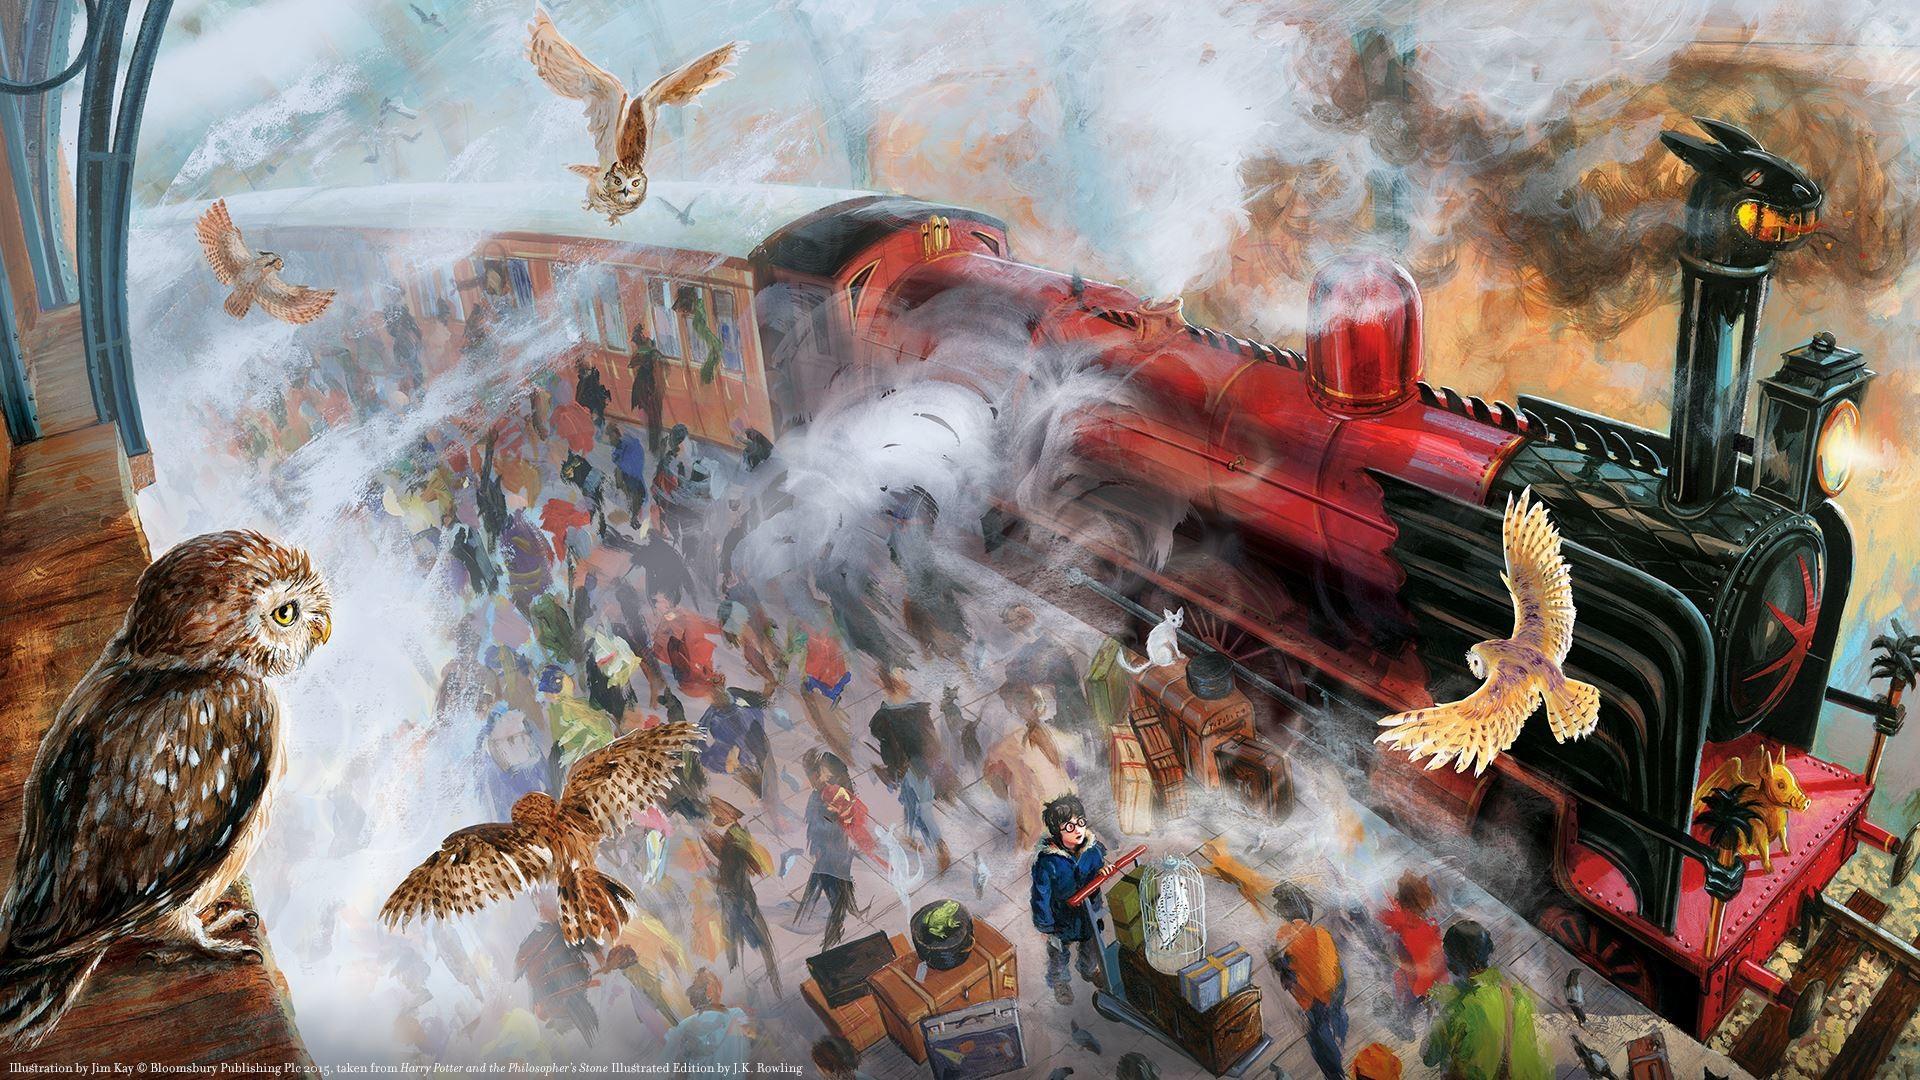 Harry Potter Wallpaper Hd (57 Wallpapers)